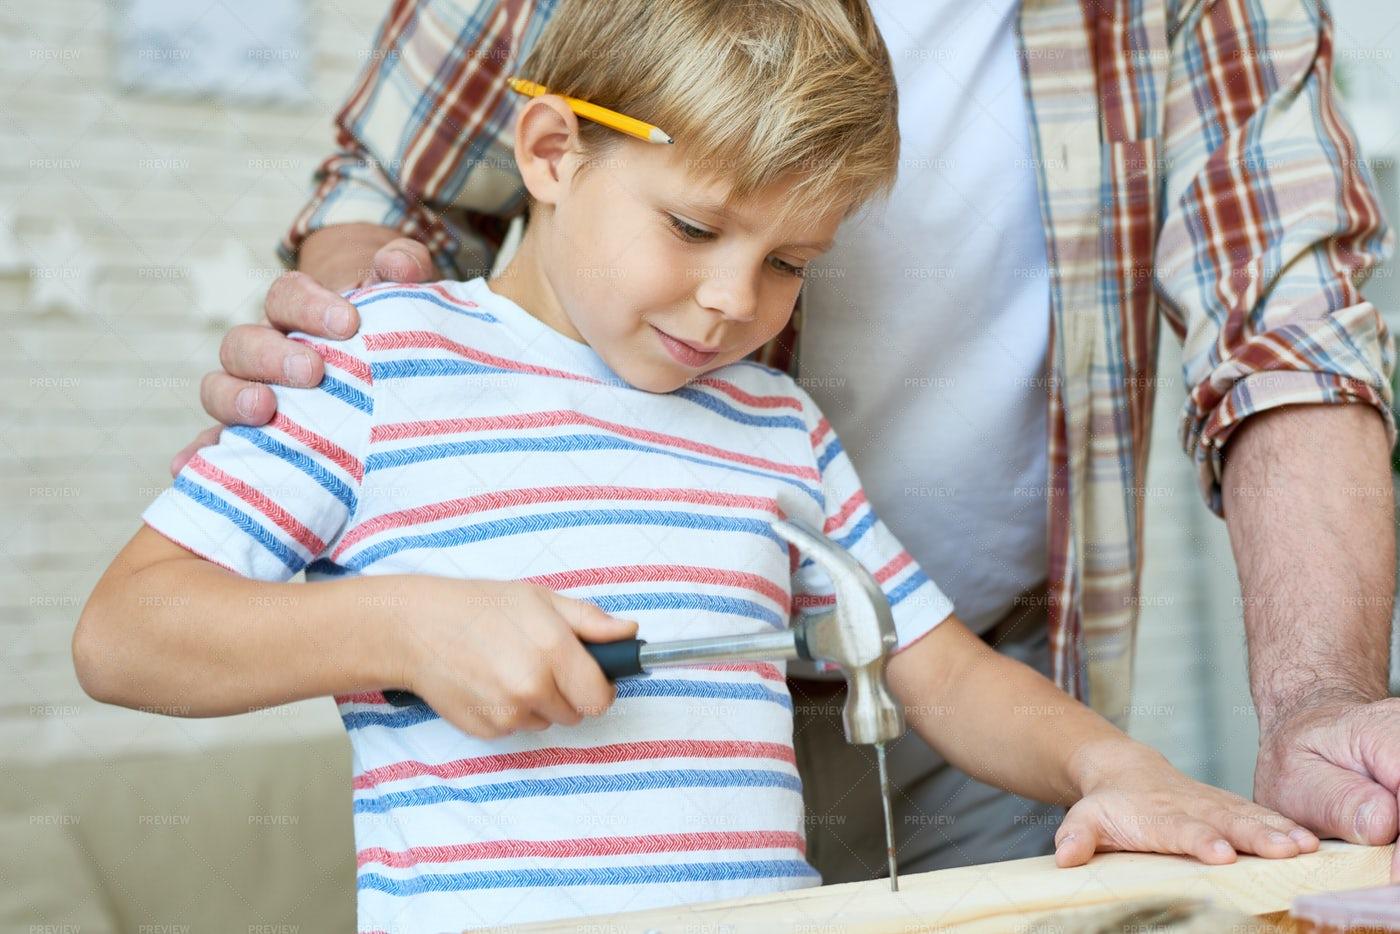 Little Boy Hammering Nails: Stock Photos